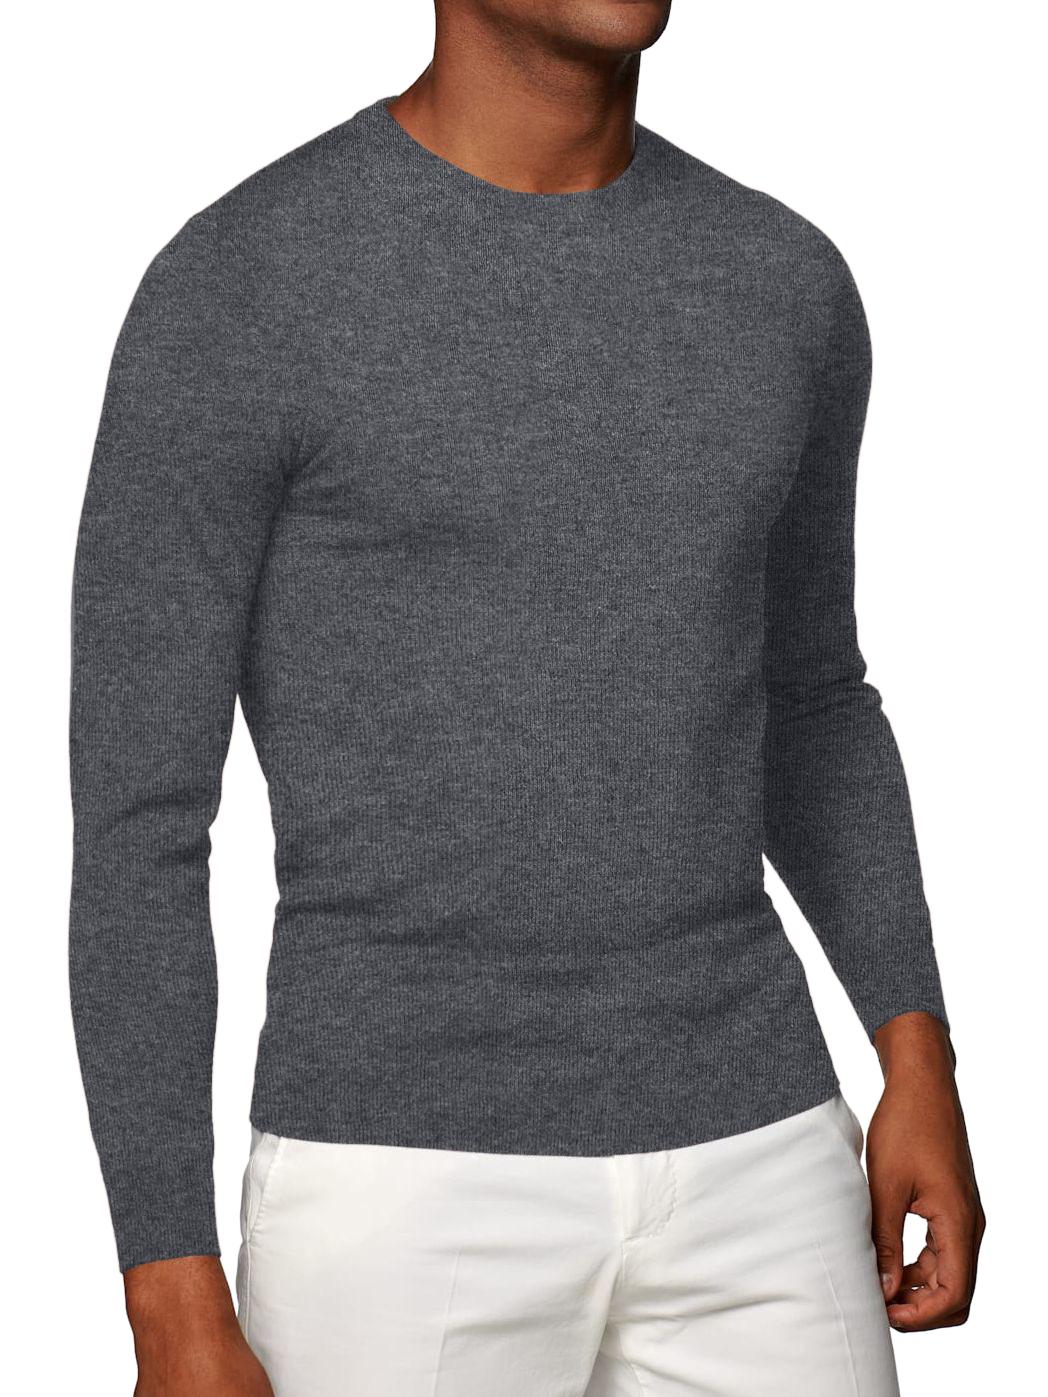 Grey Merino Wool Crew Neck Sweater